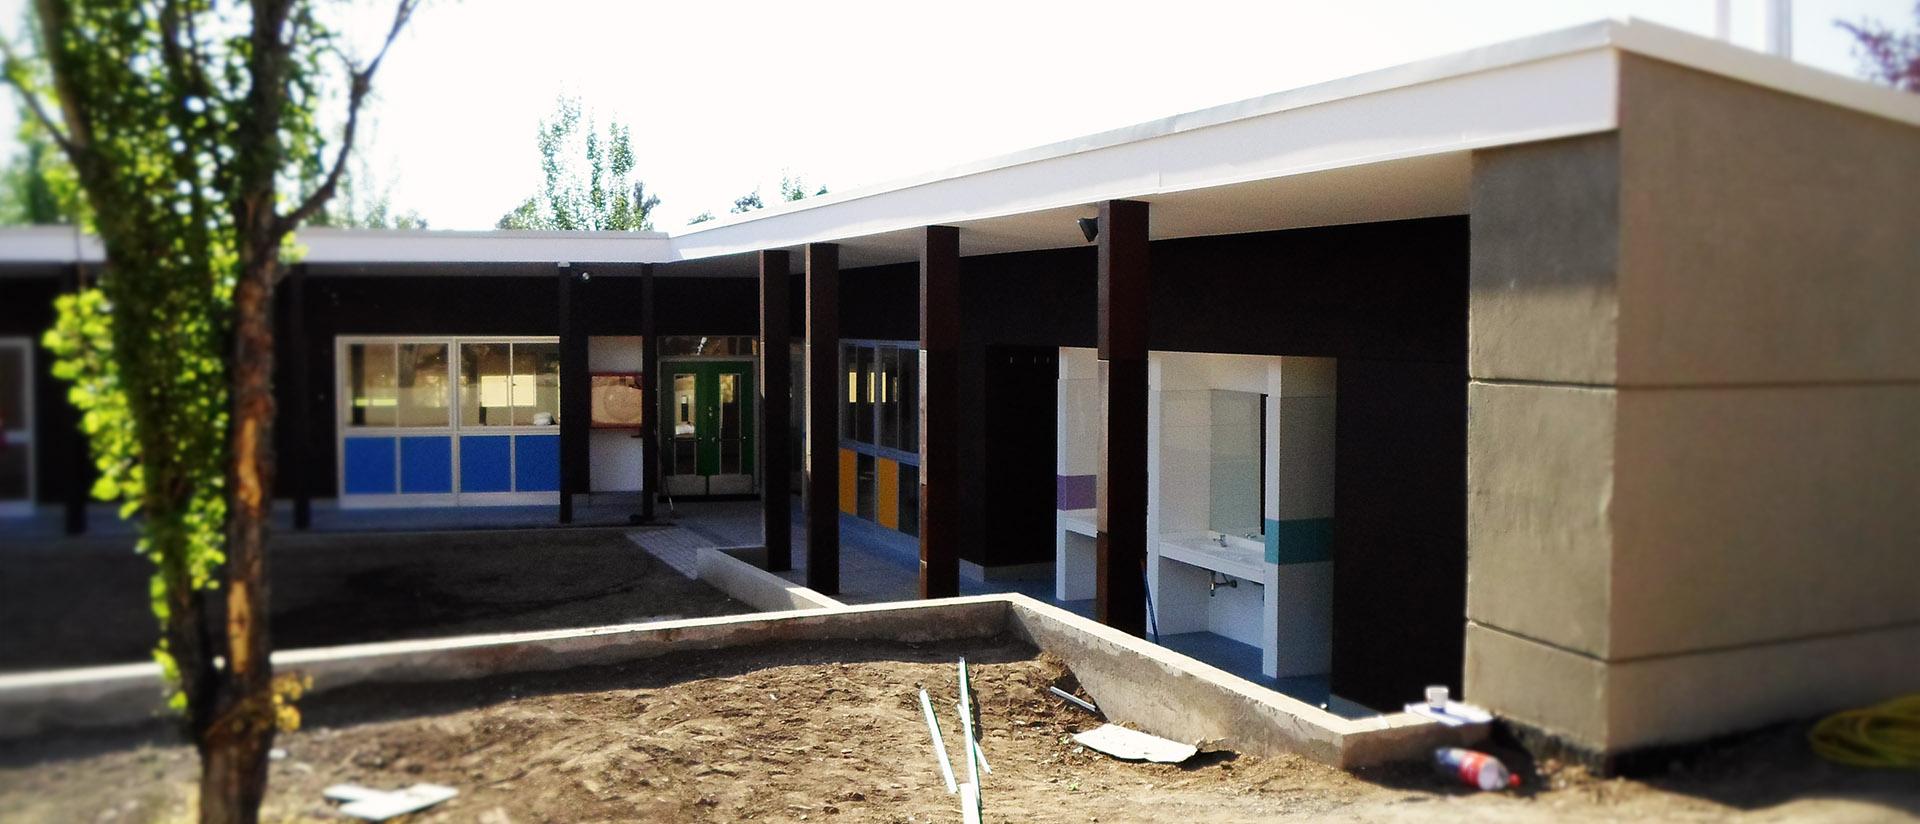 Ampliación Escuela Angelitos Verdes